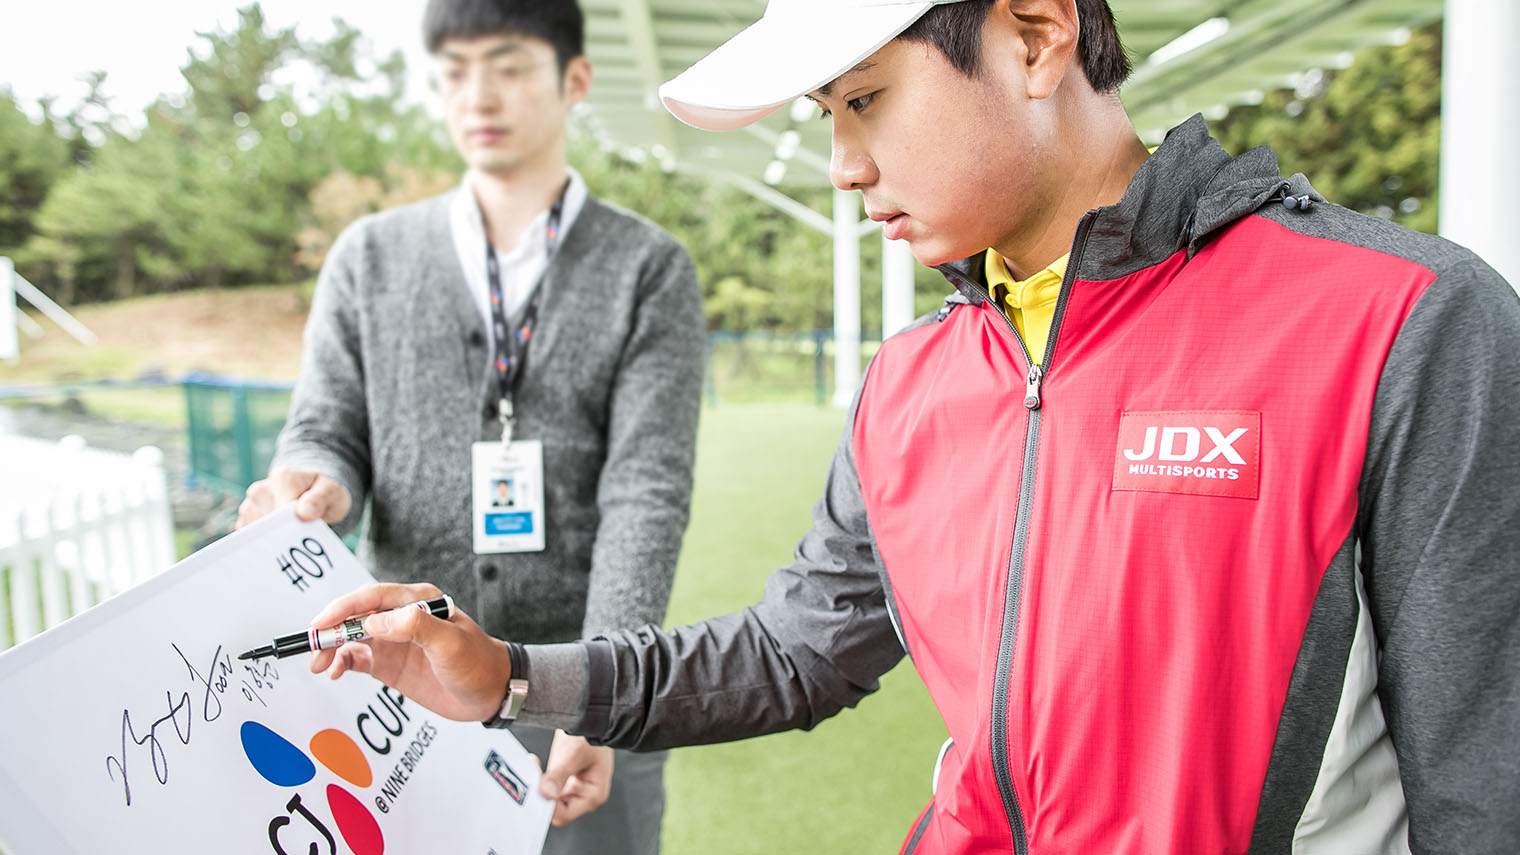 THE CJ CUP @ NINE BRIDGES 에 사인을 하며 출전 결의를 다지는 이형준 선수